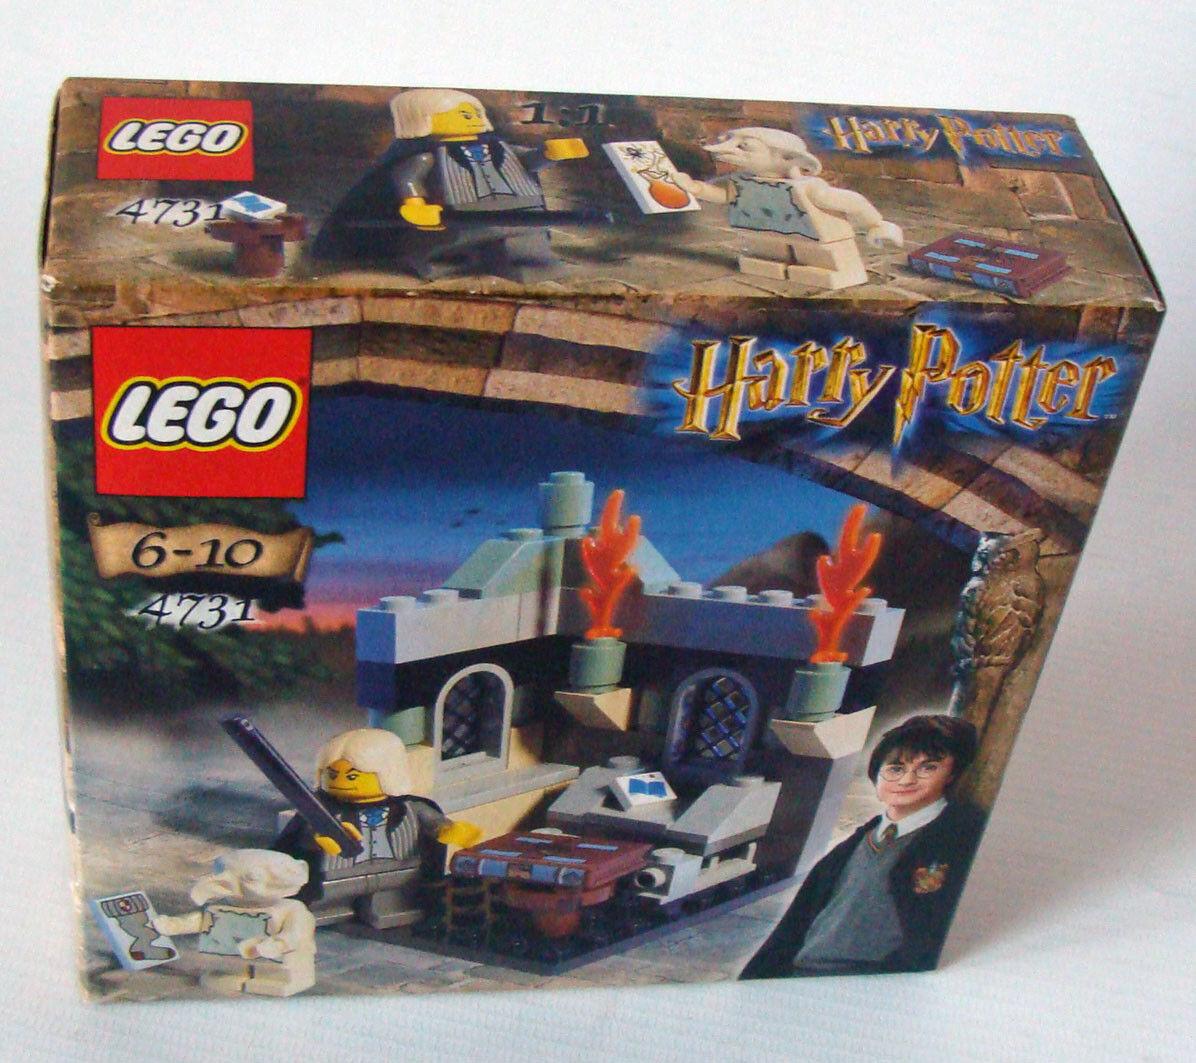 Lego® Harry Potter 4731 - Dobbys Befreiung 70 Teile 6-10 Jahren - Neu